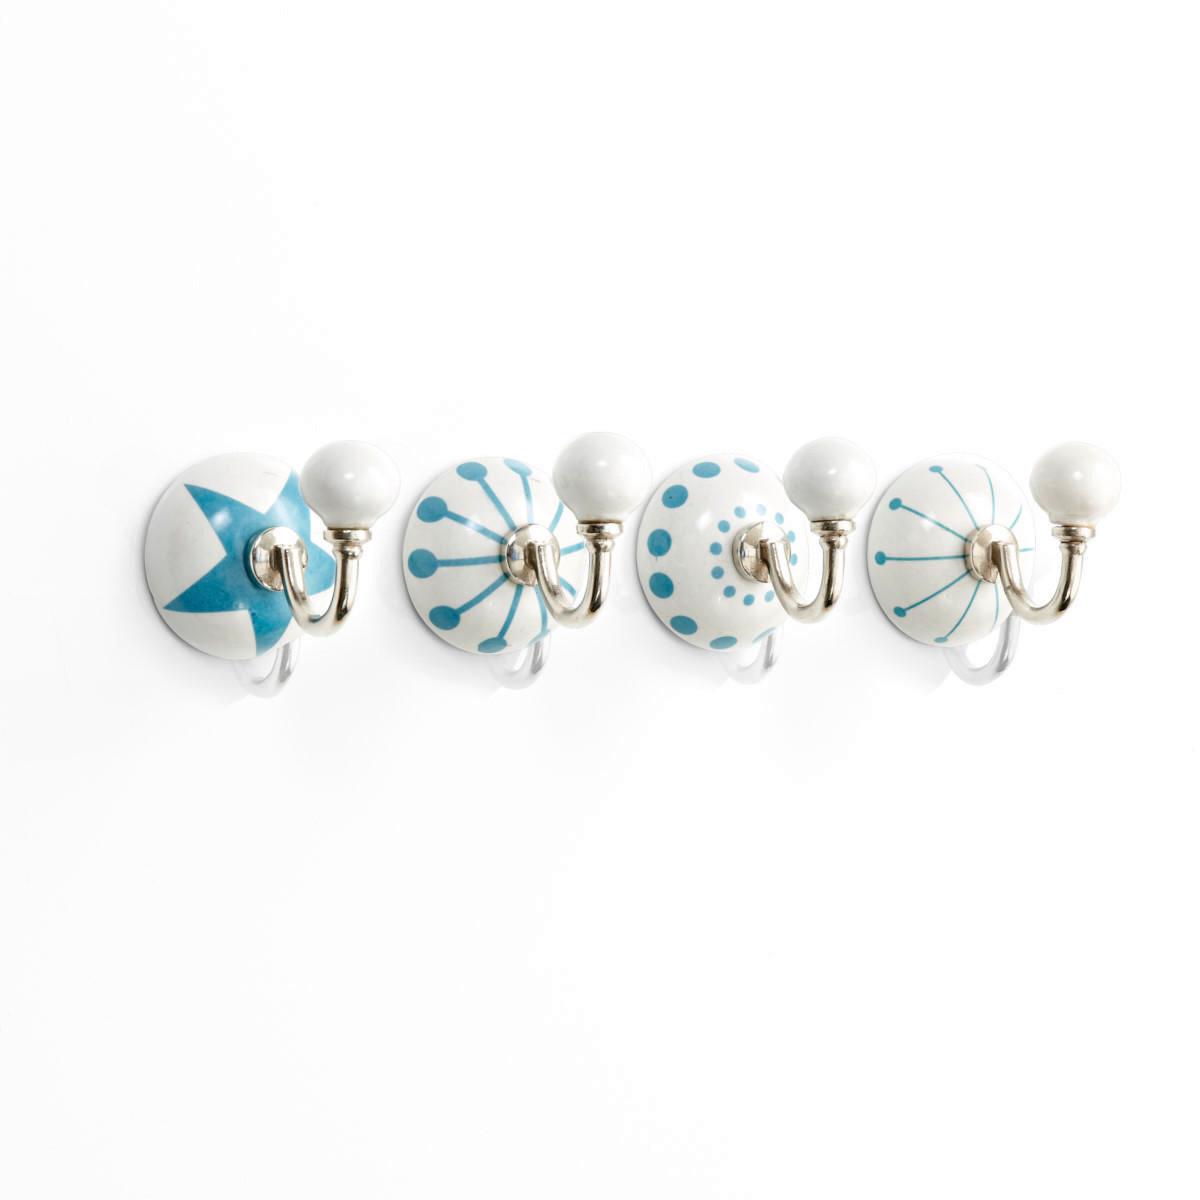 Haken-Set, 4-tlg., Musterung, Keramik, Metall (Impressionen)